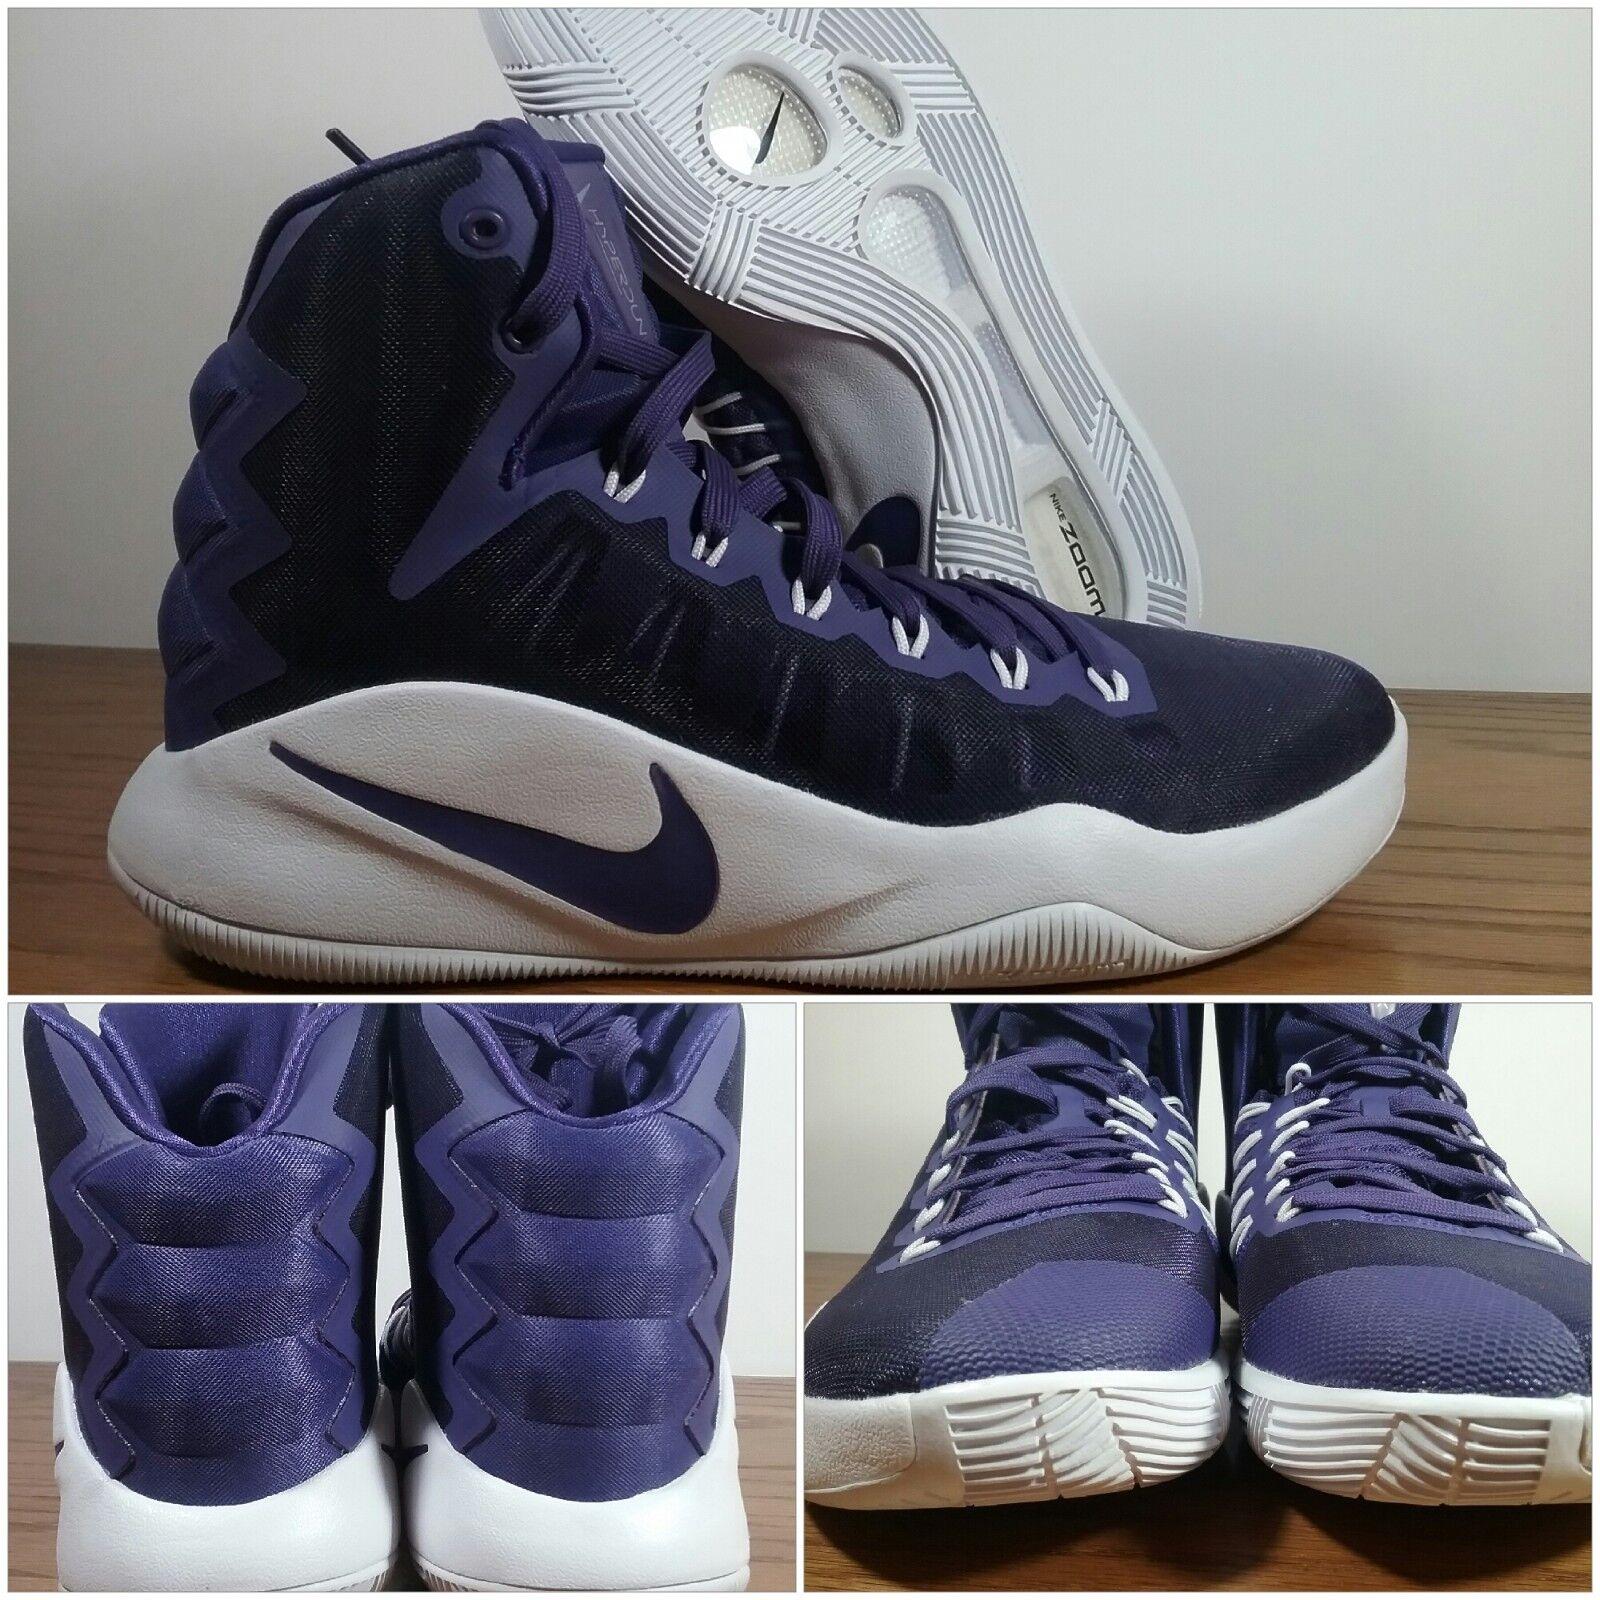 New Nike Hyperdunk 2016 Court Purple White Basketball Women's Sizes 856487-551